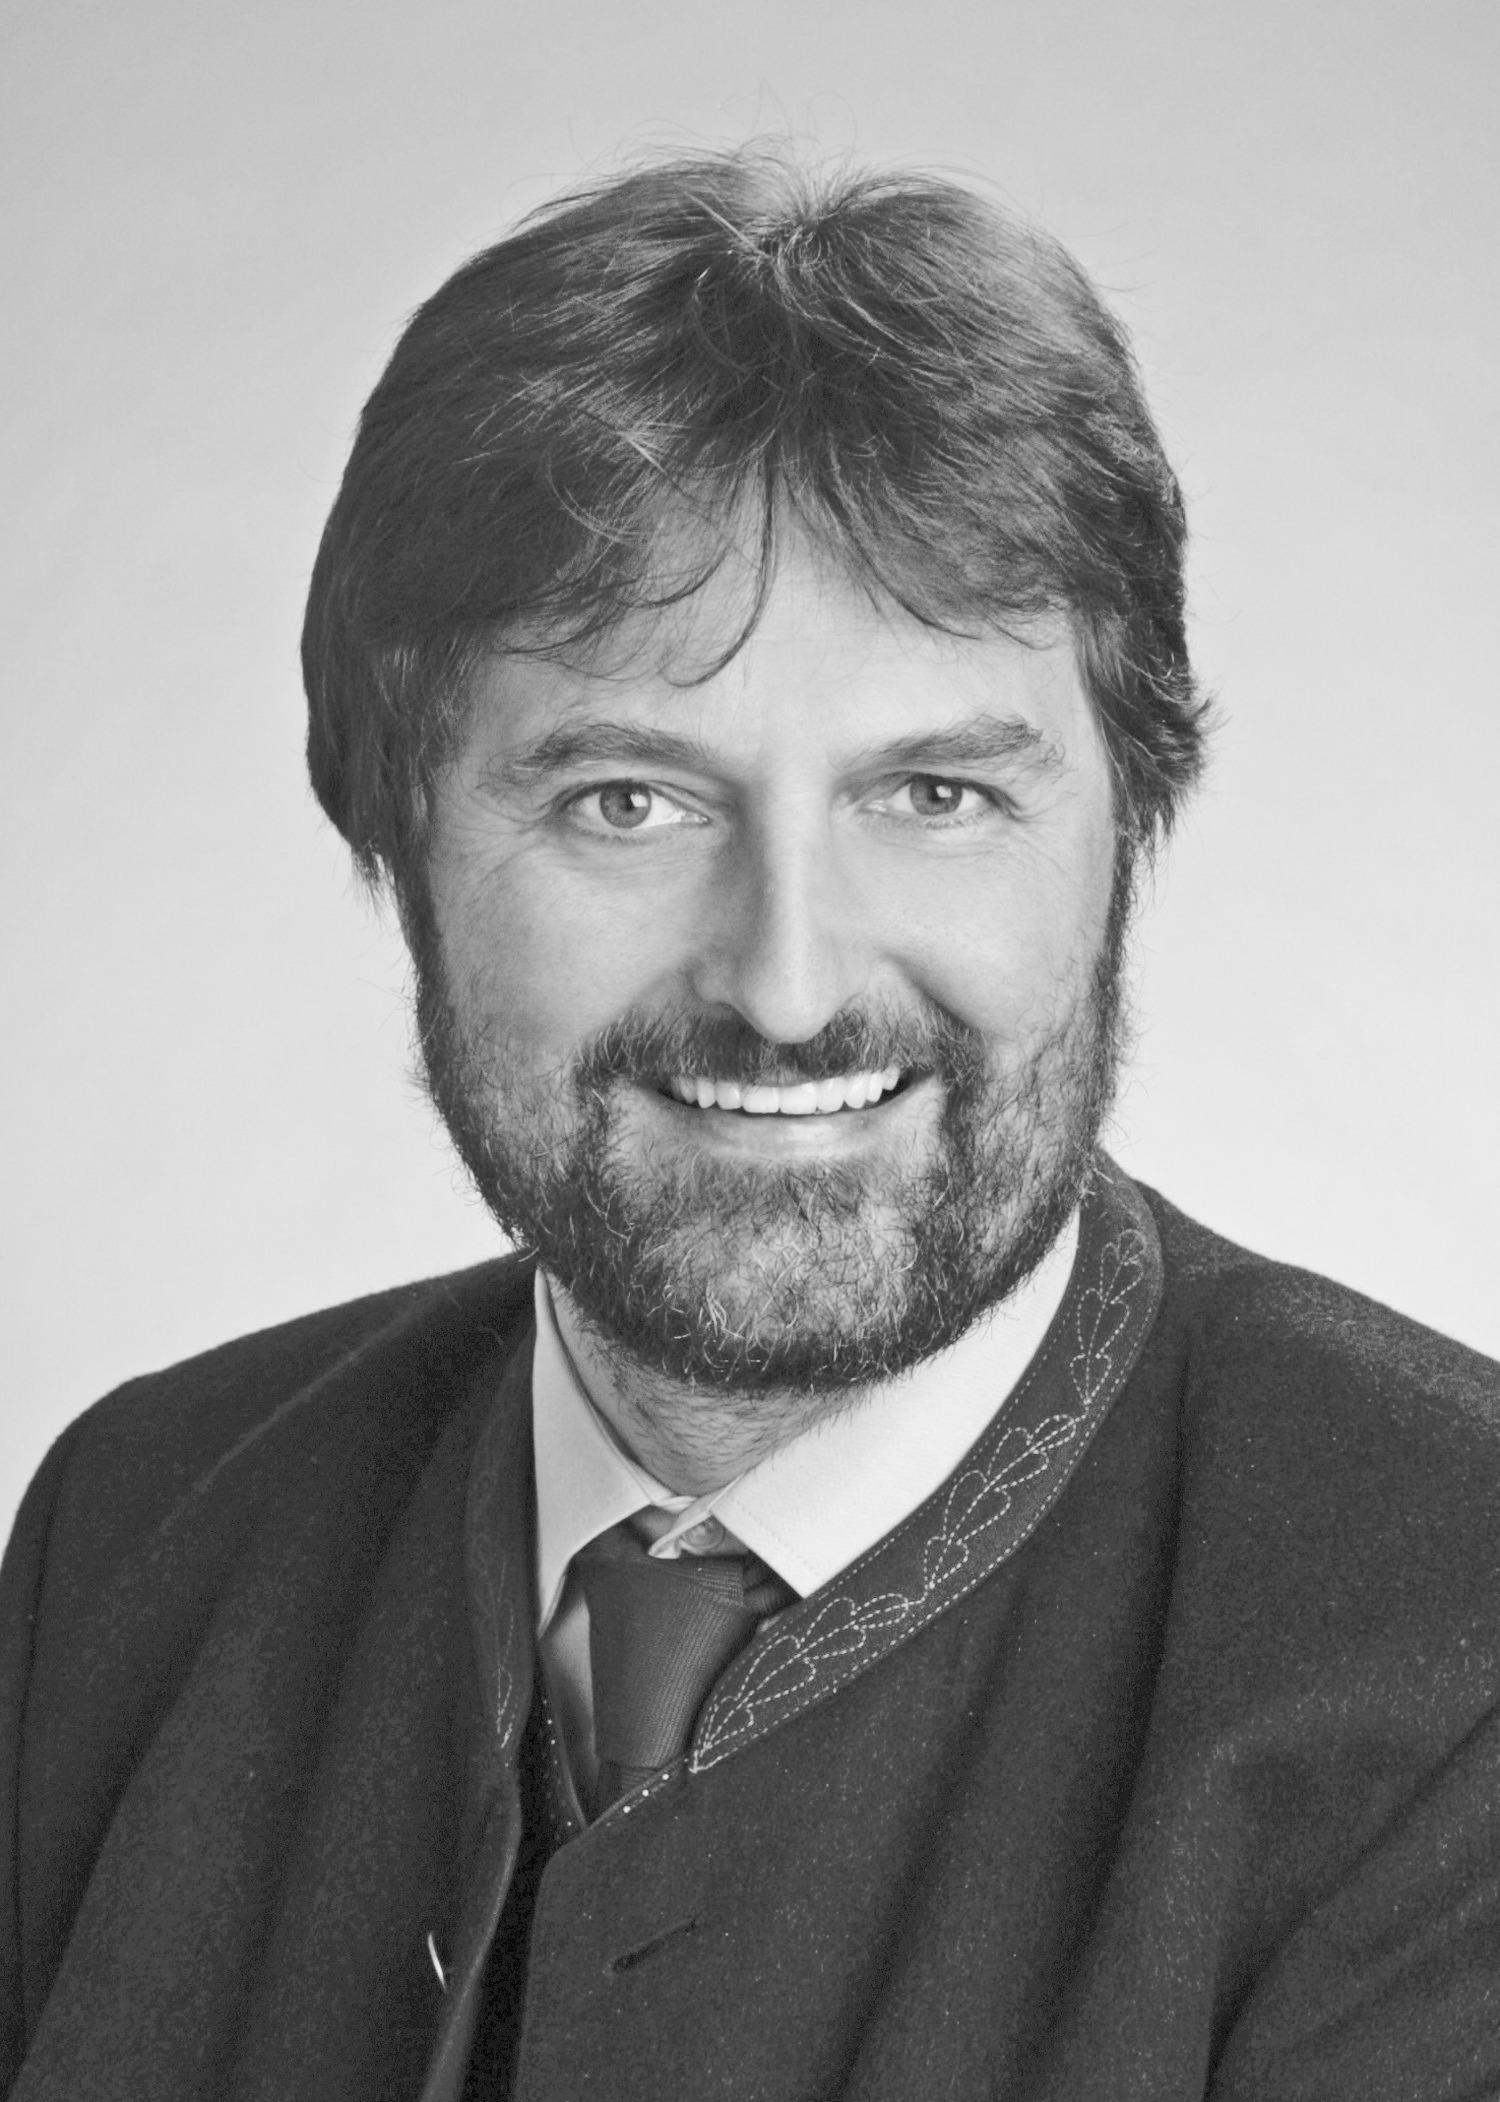 Christoph Puelacher